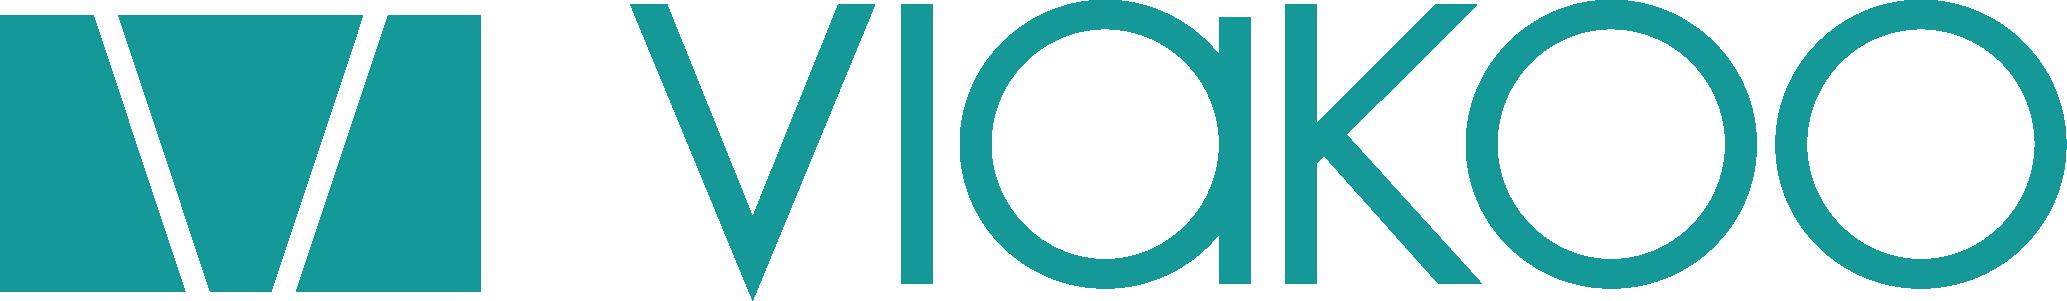 Viakoo_Logo.png